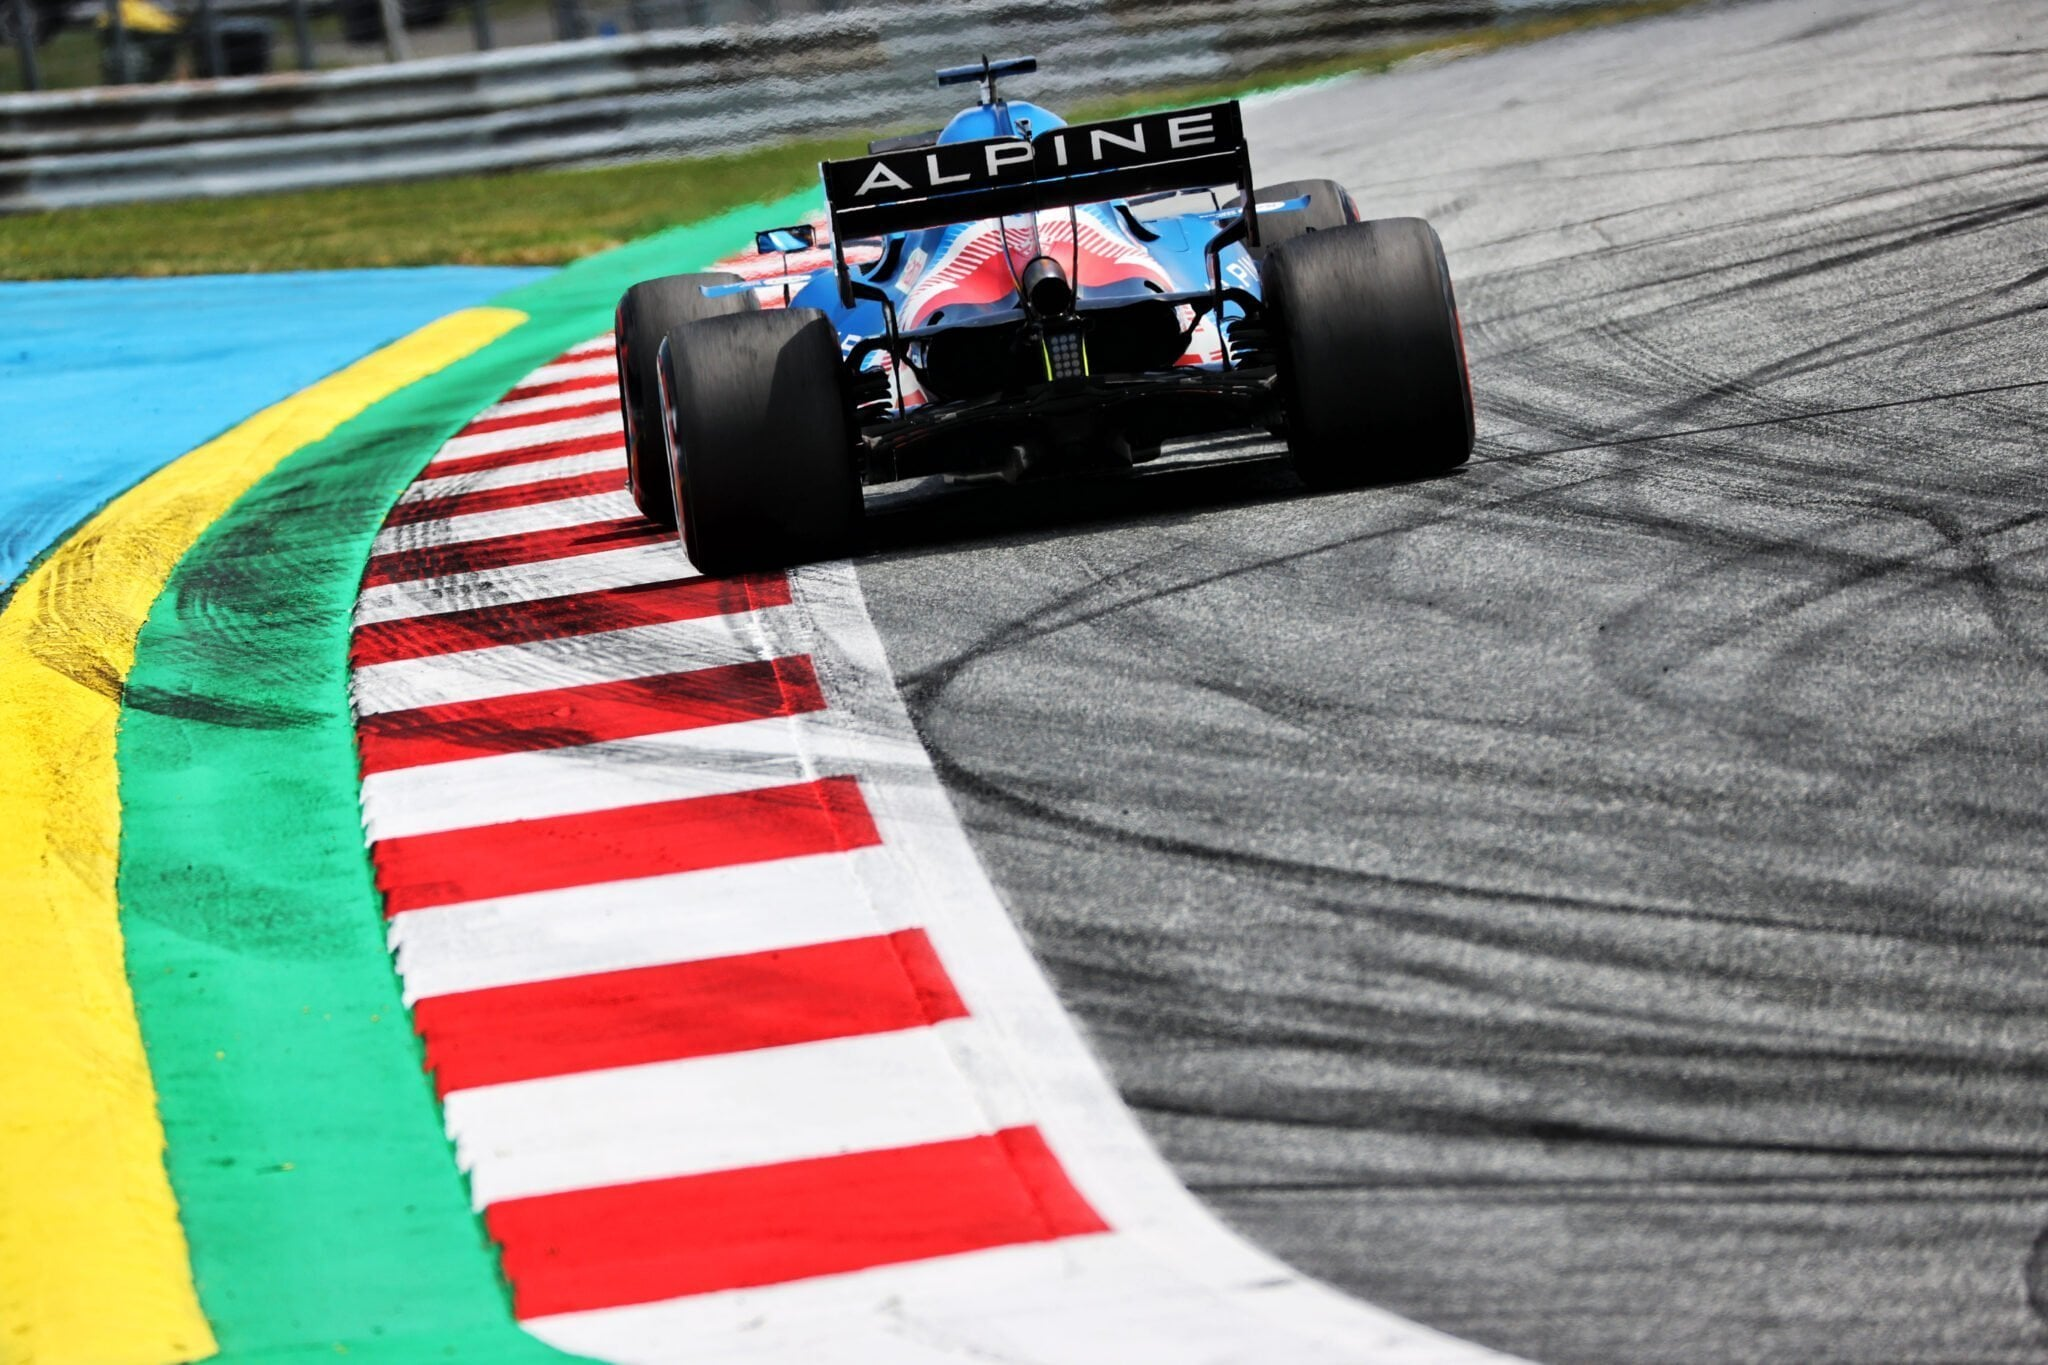 Alpine F1 Team Alonso Ocon Autriche Steiermark Grand Prix Spielberg A521 2021 22 | Alpine F1 : Alonso rapporte deux points au Grand Prix BWT de Styrie